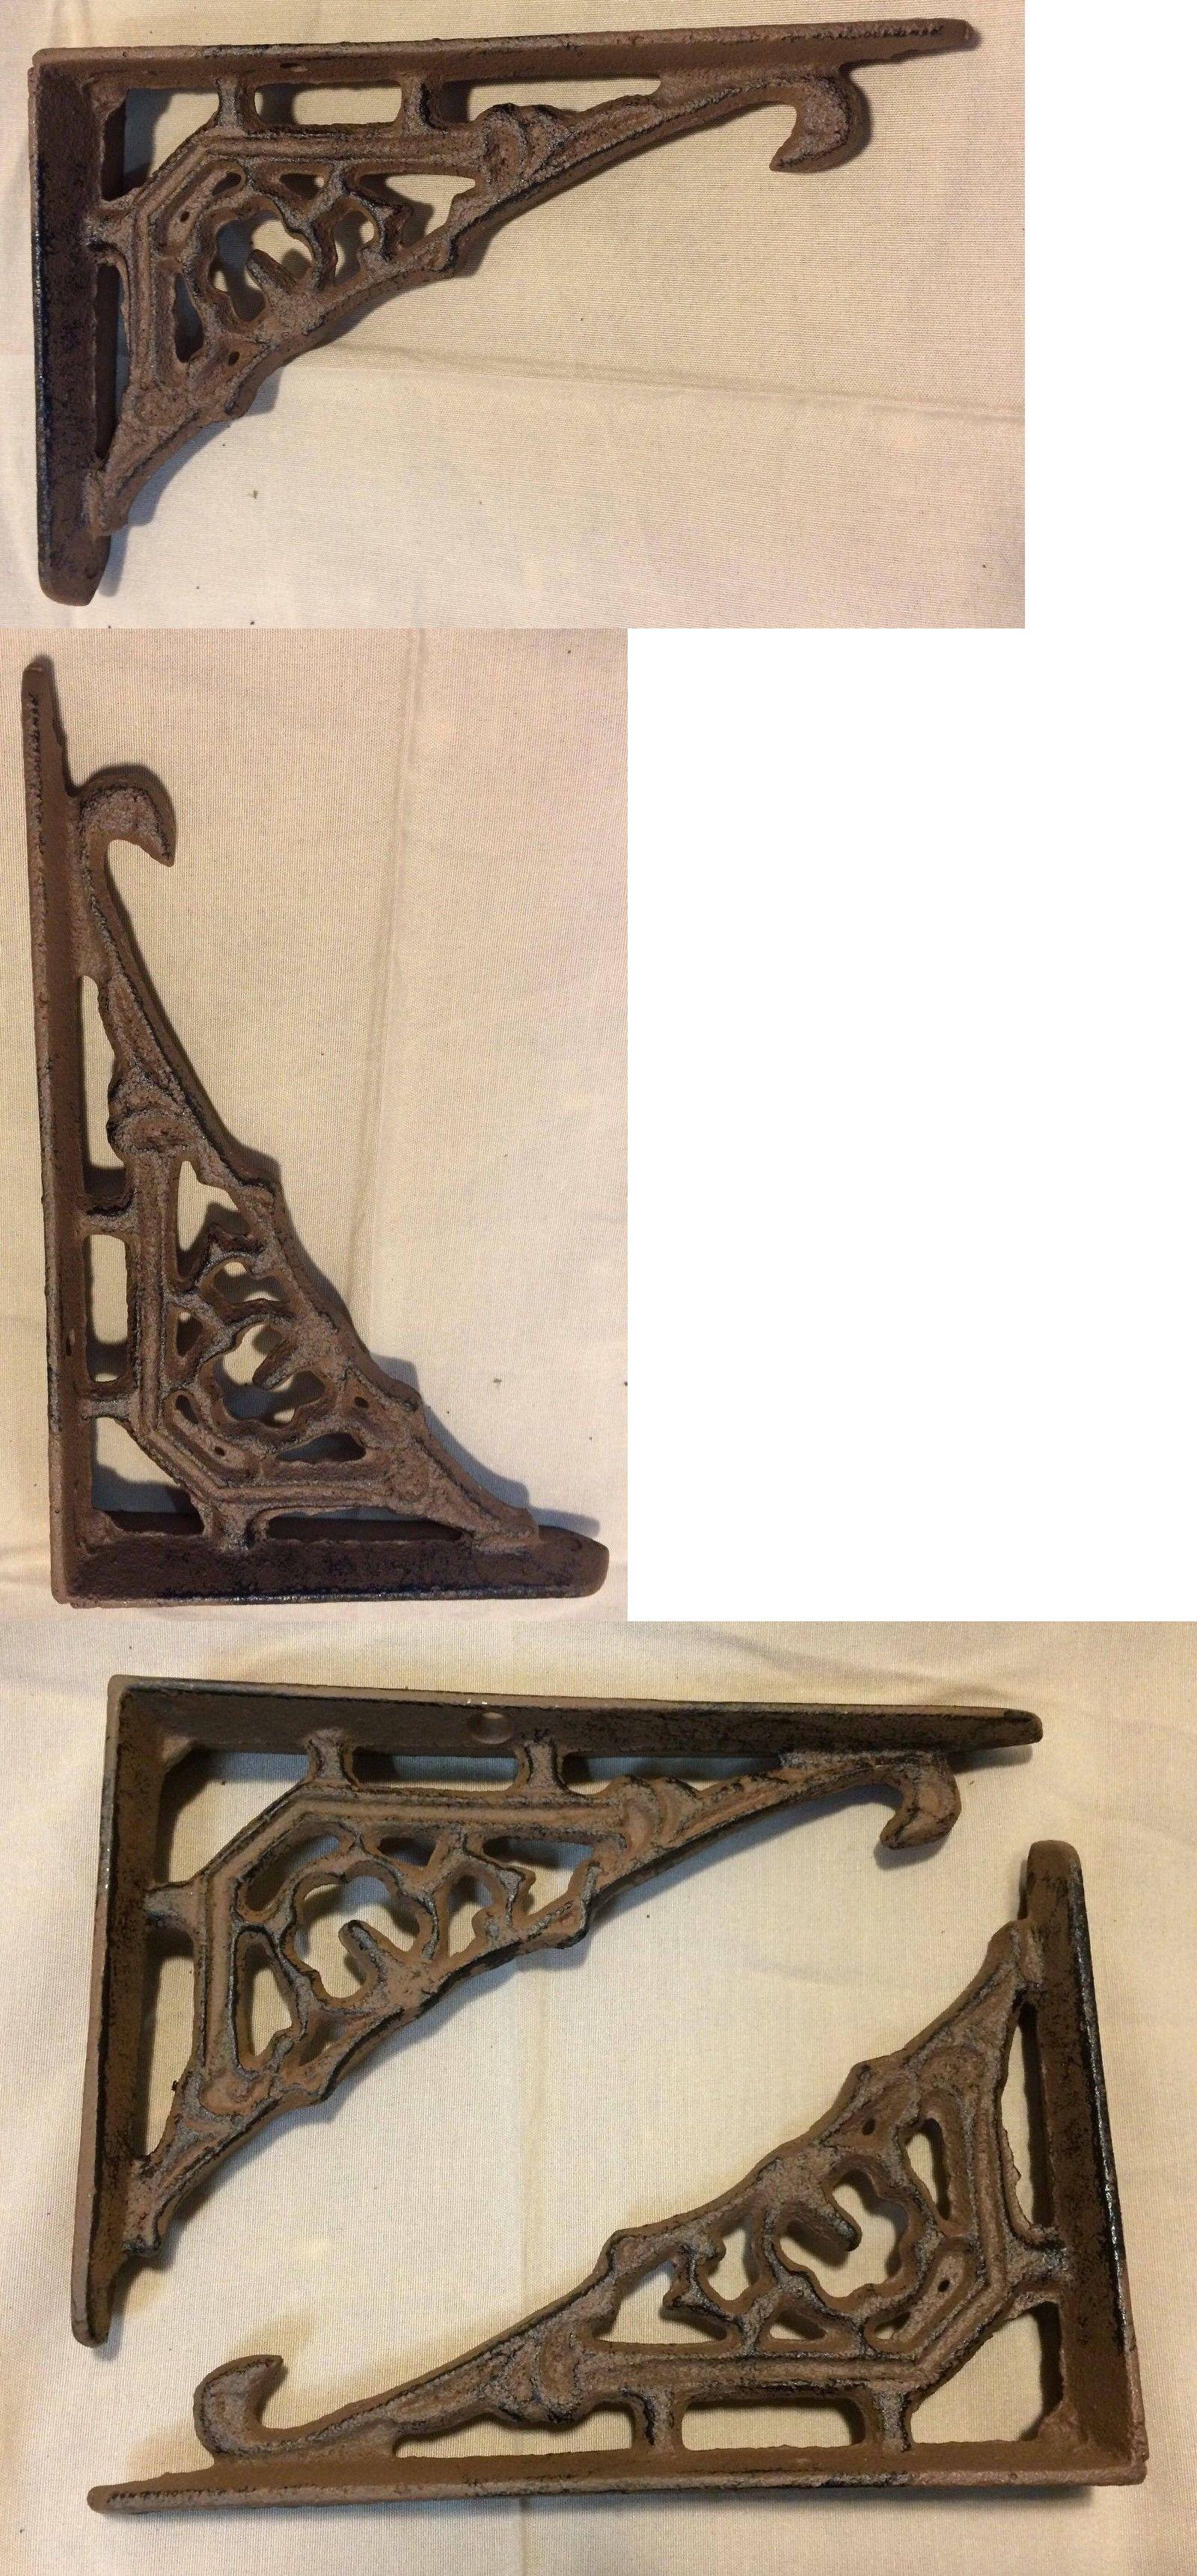 SET OF 2 CAST IRON GINGERBREAD BRACE SHELF BRACKETS antique brown patina finish